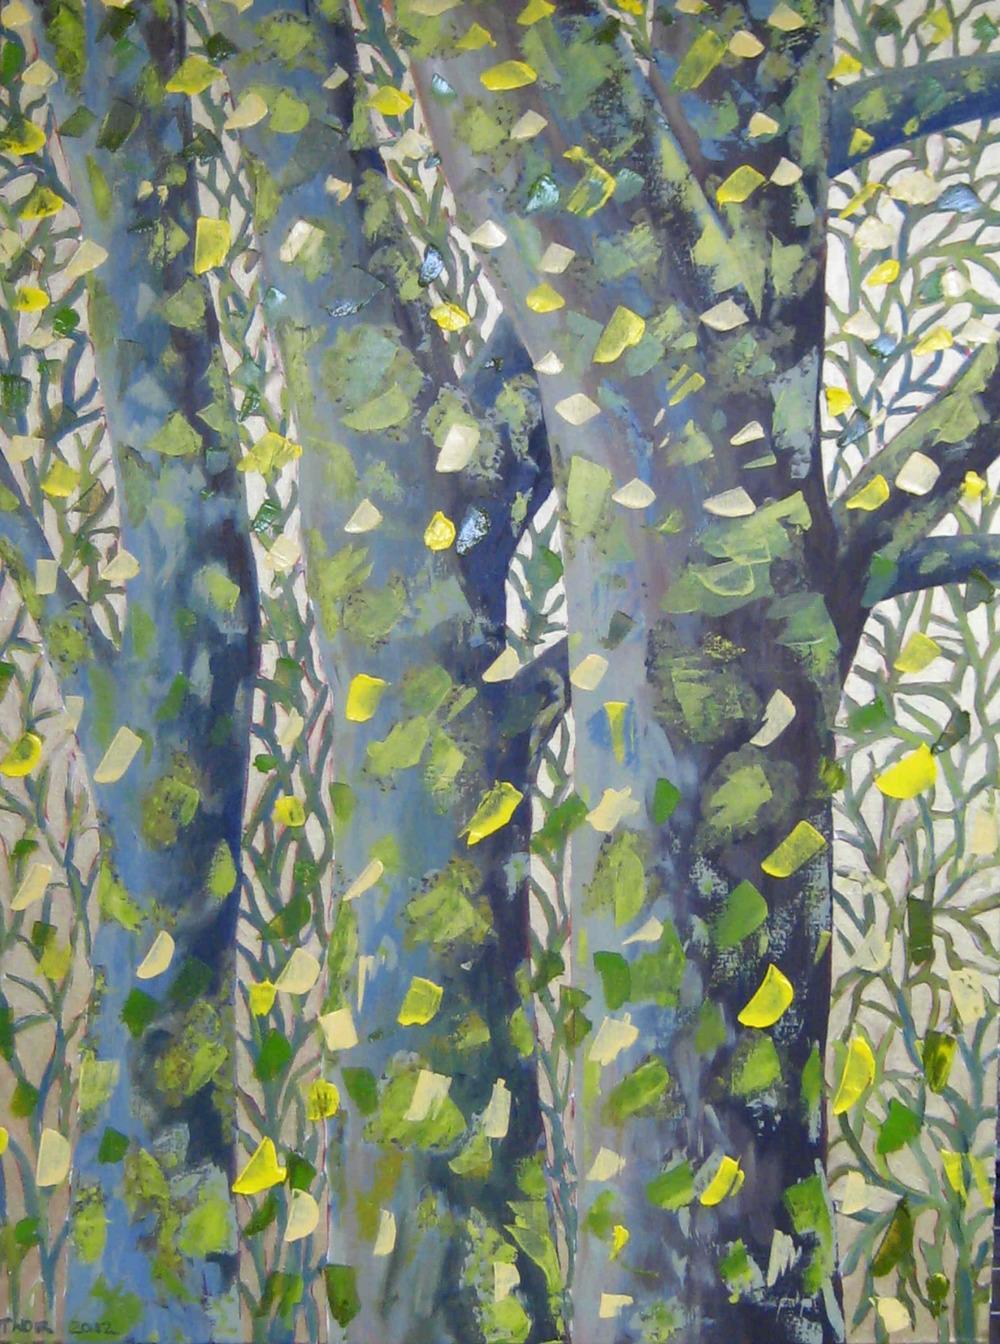 Tree Trunks with Lichen